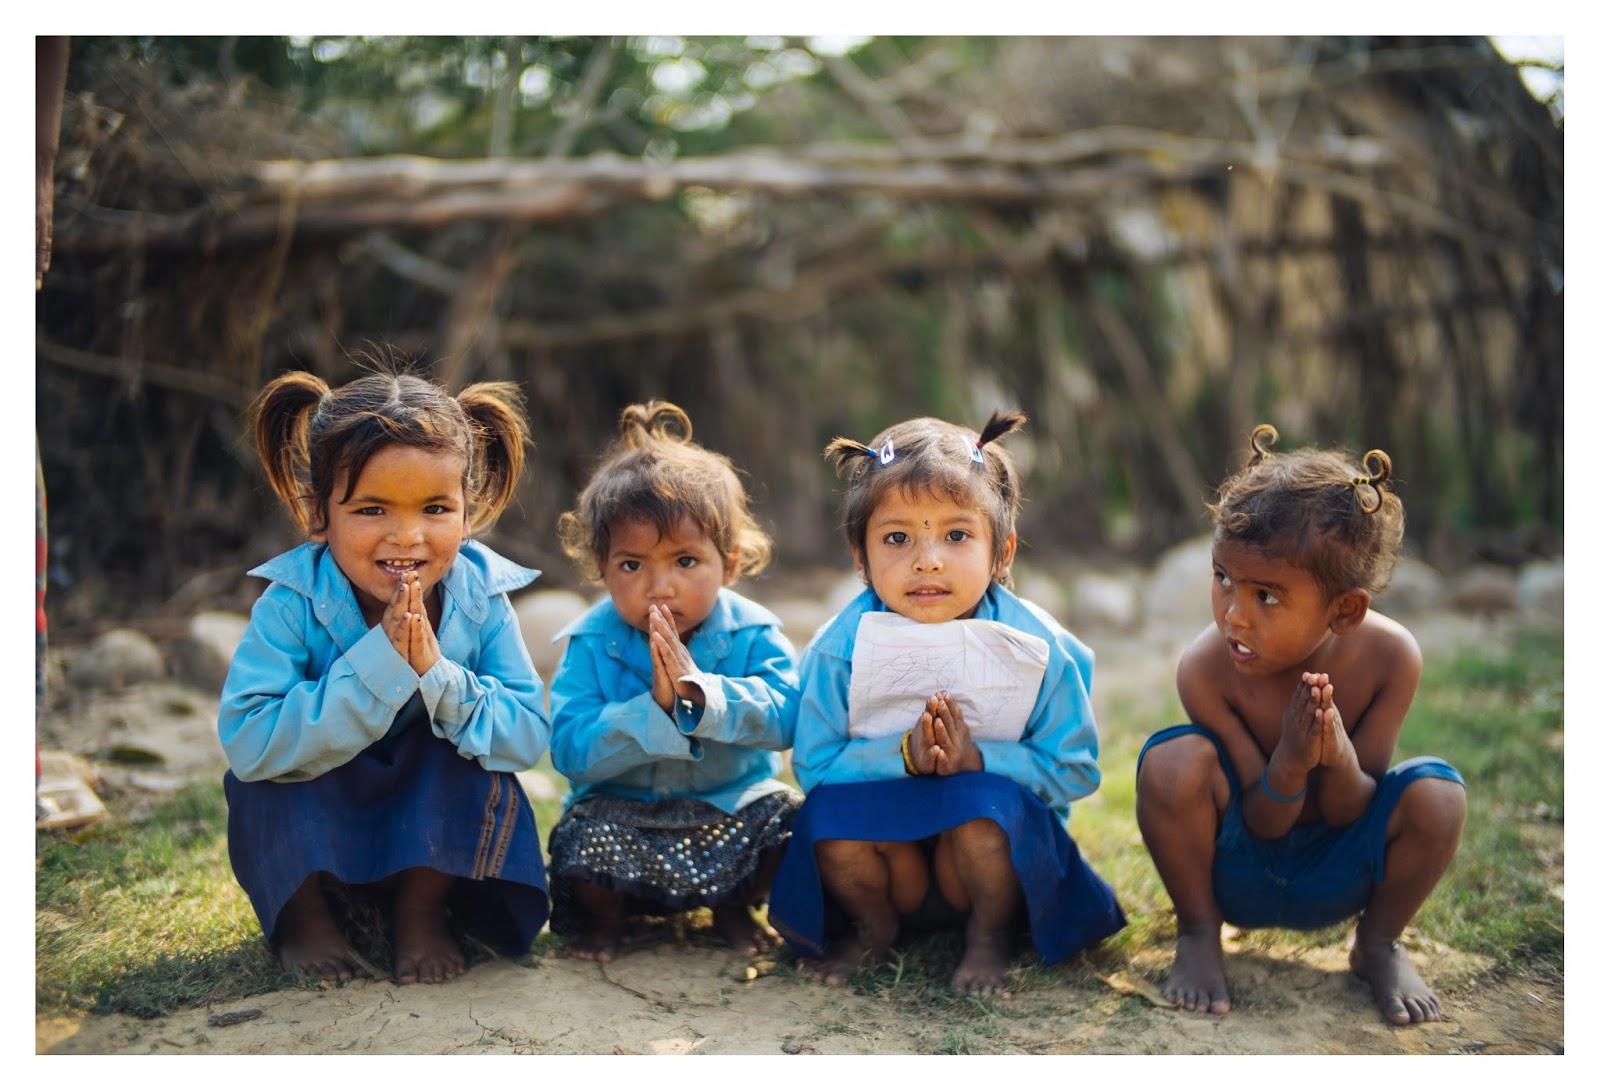 One Photo Per Child - Nepal